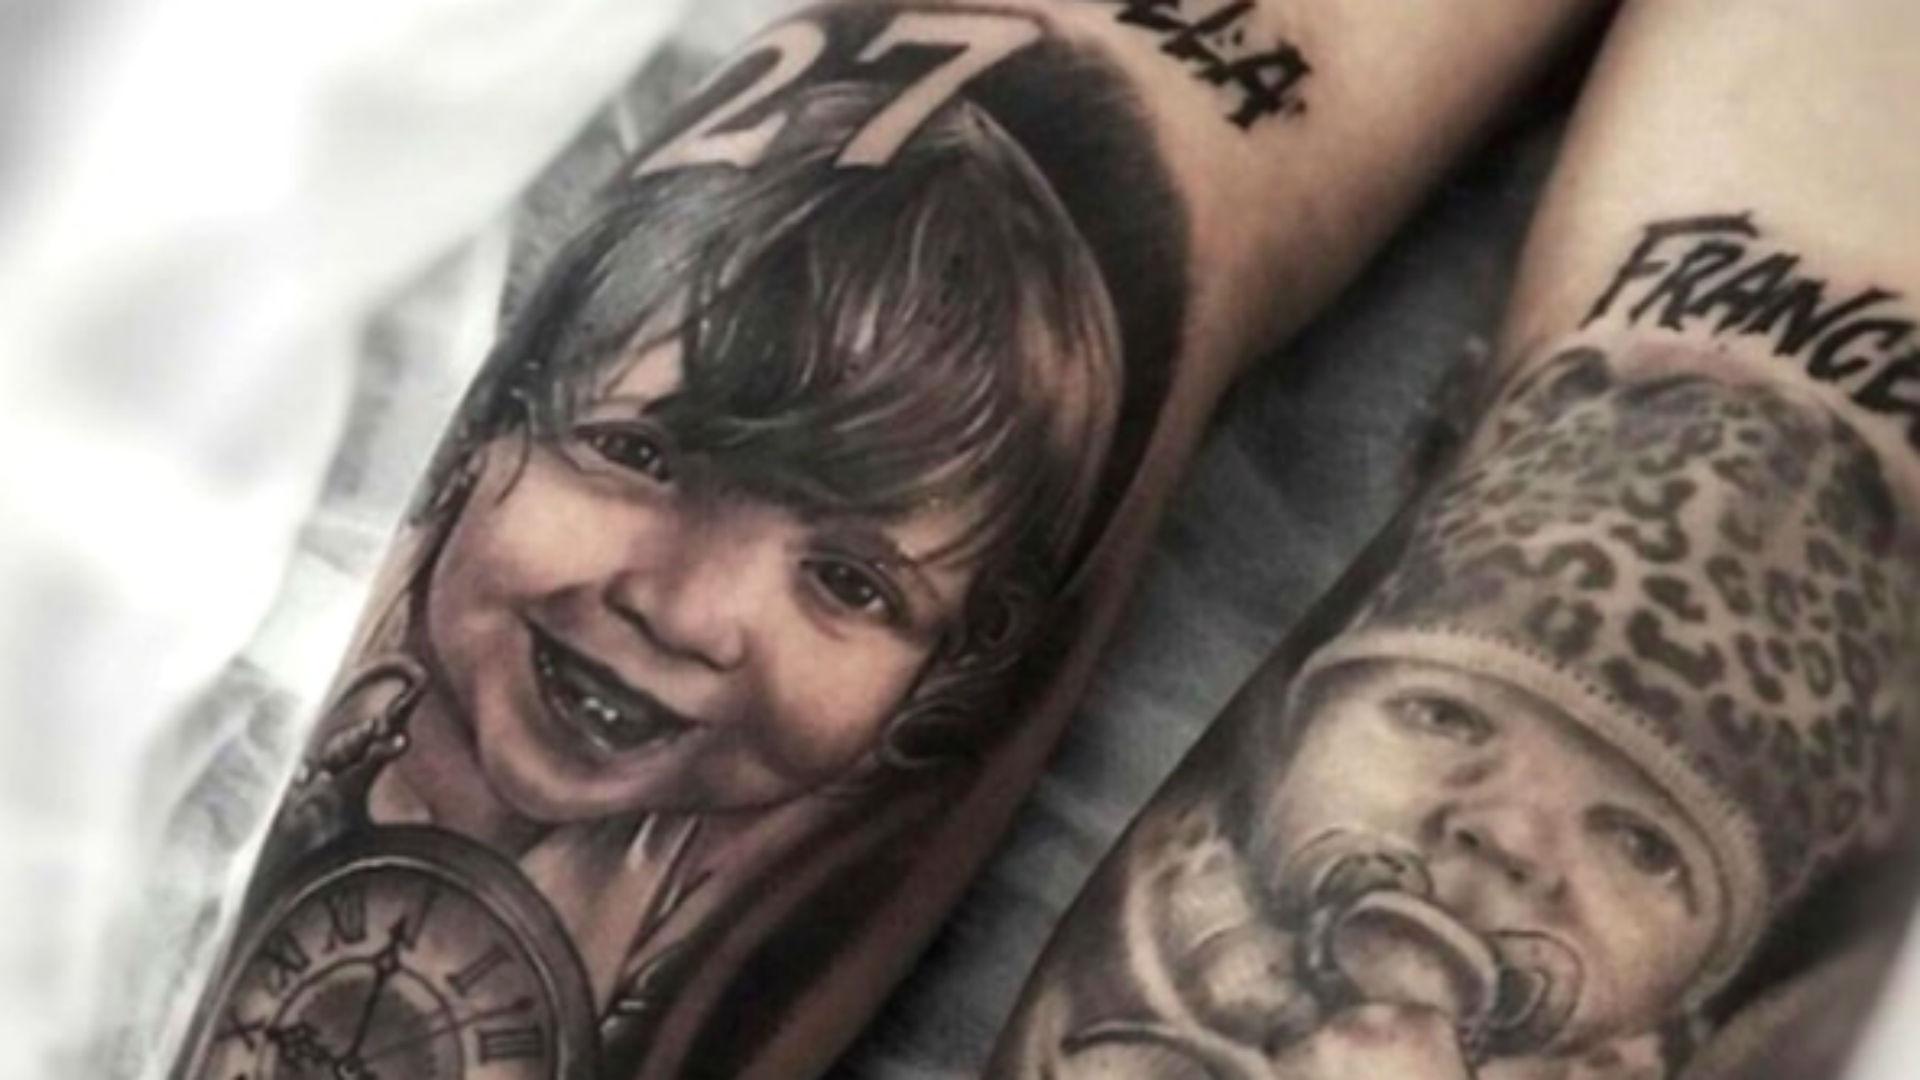 Icardi tatuaggio